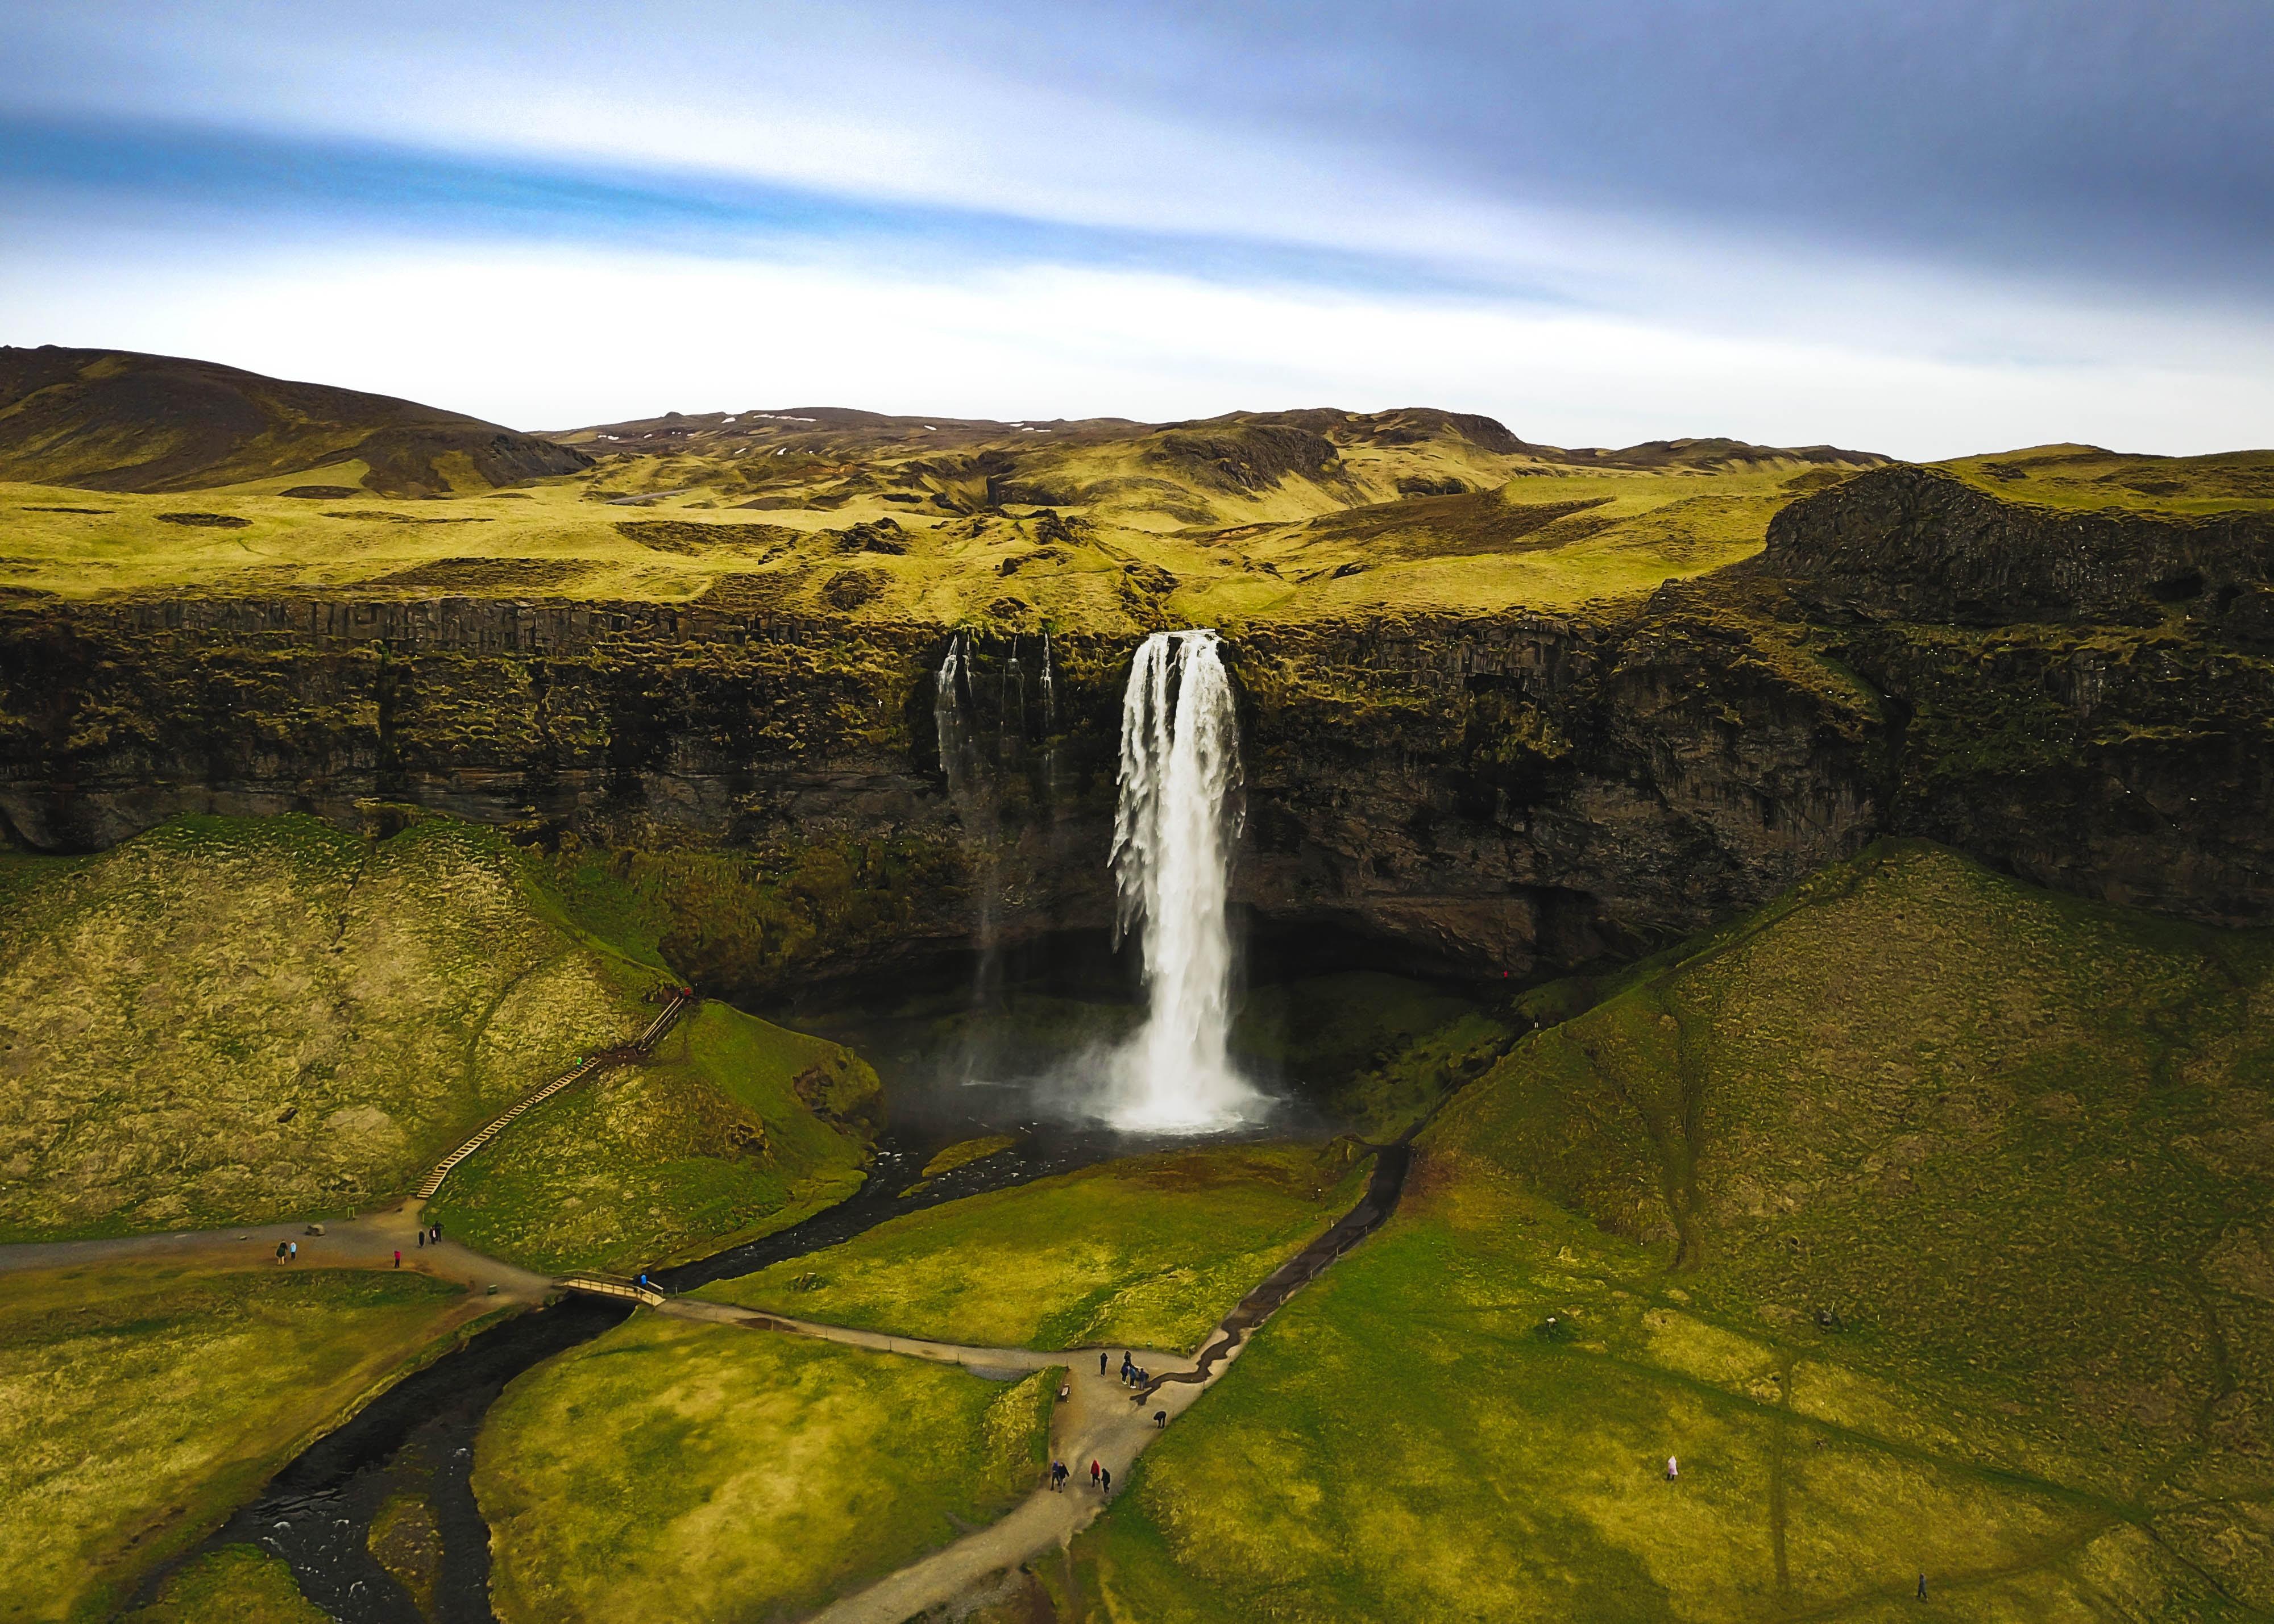 DJI Mavic photo of beautiful waterfall in Iceland, Seljalandsfoss. Iceland trip May 2017.